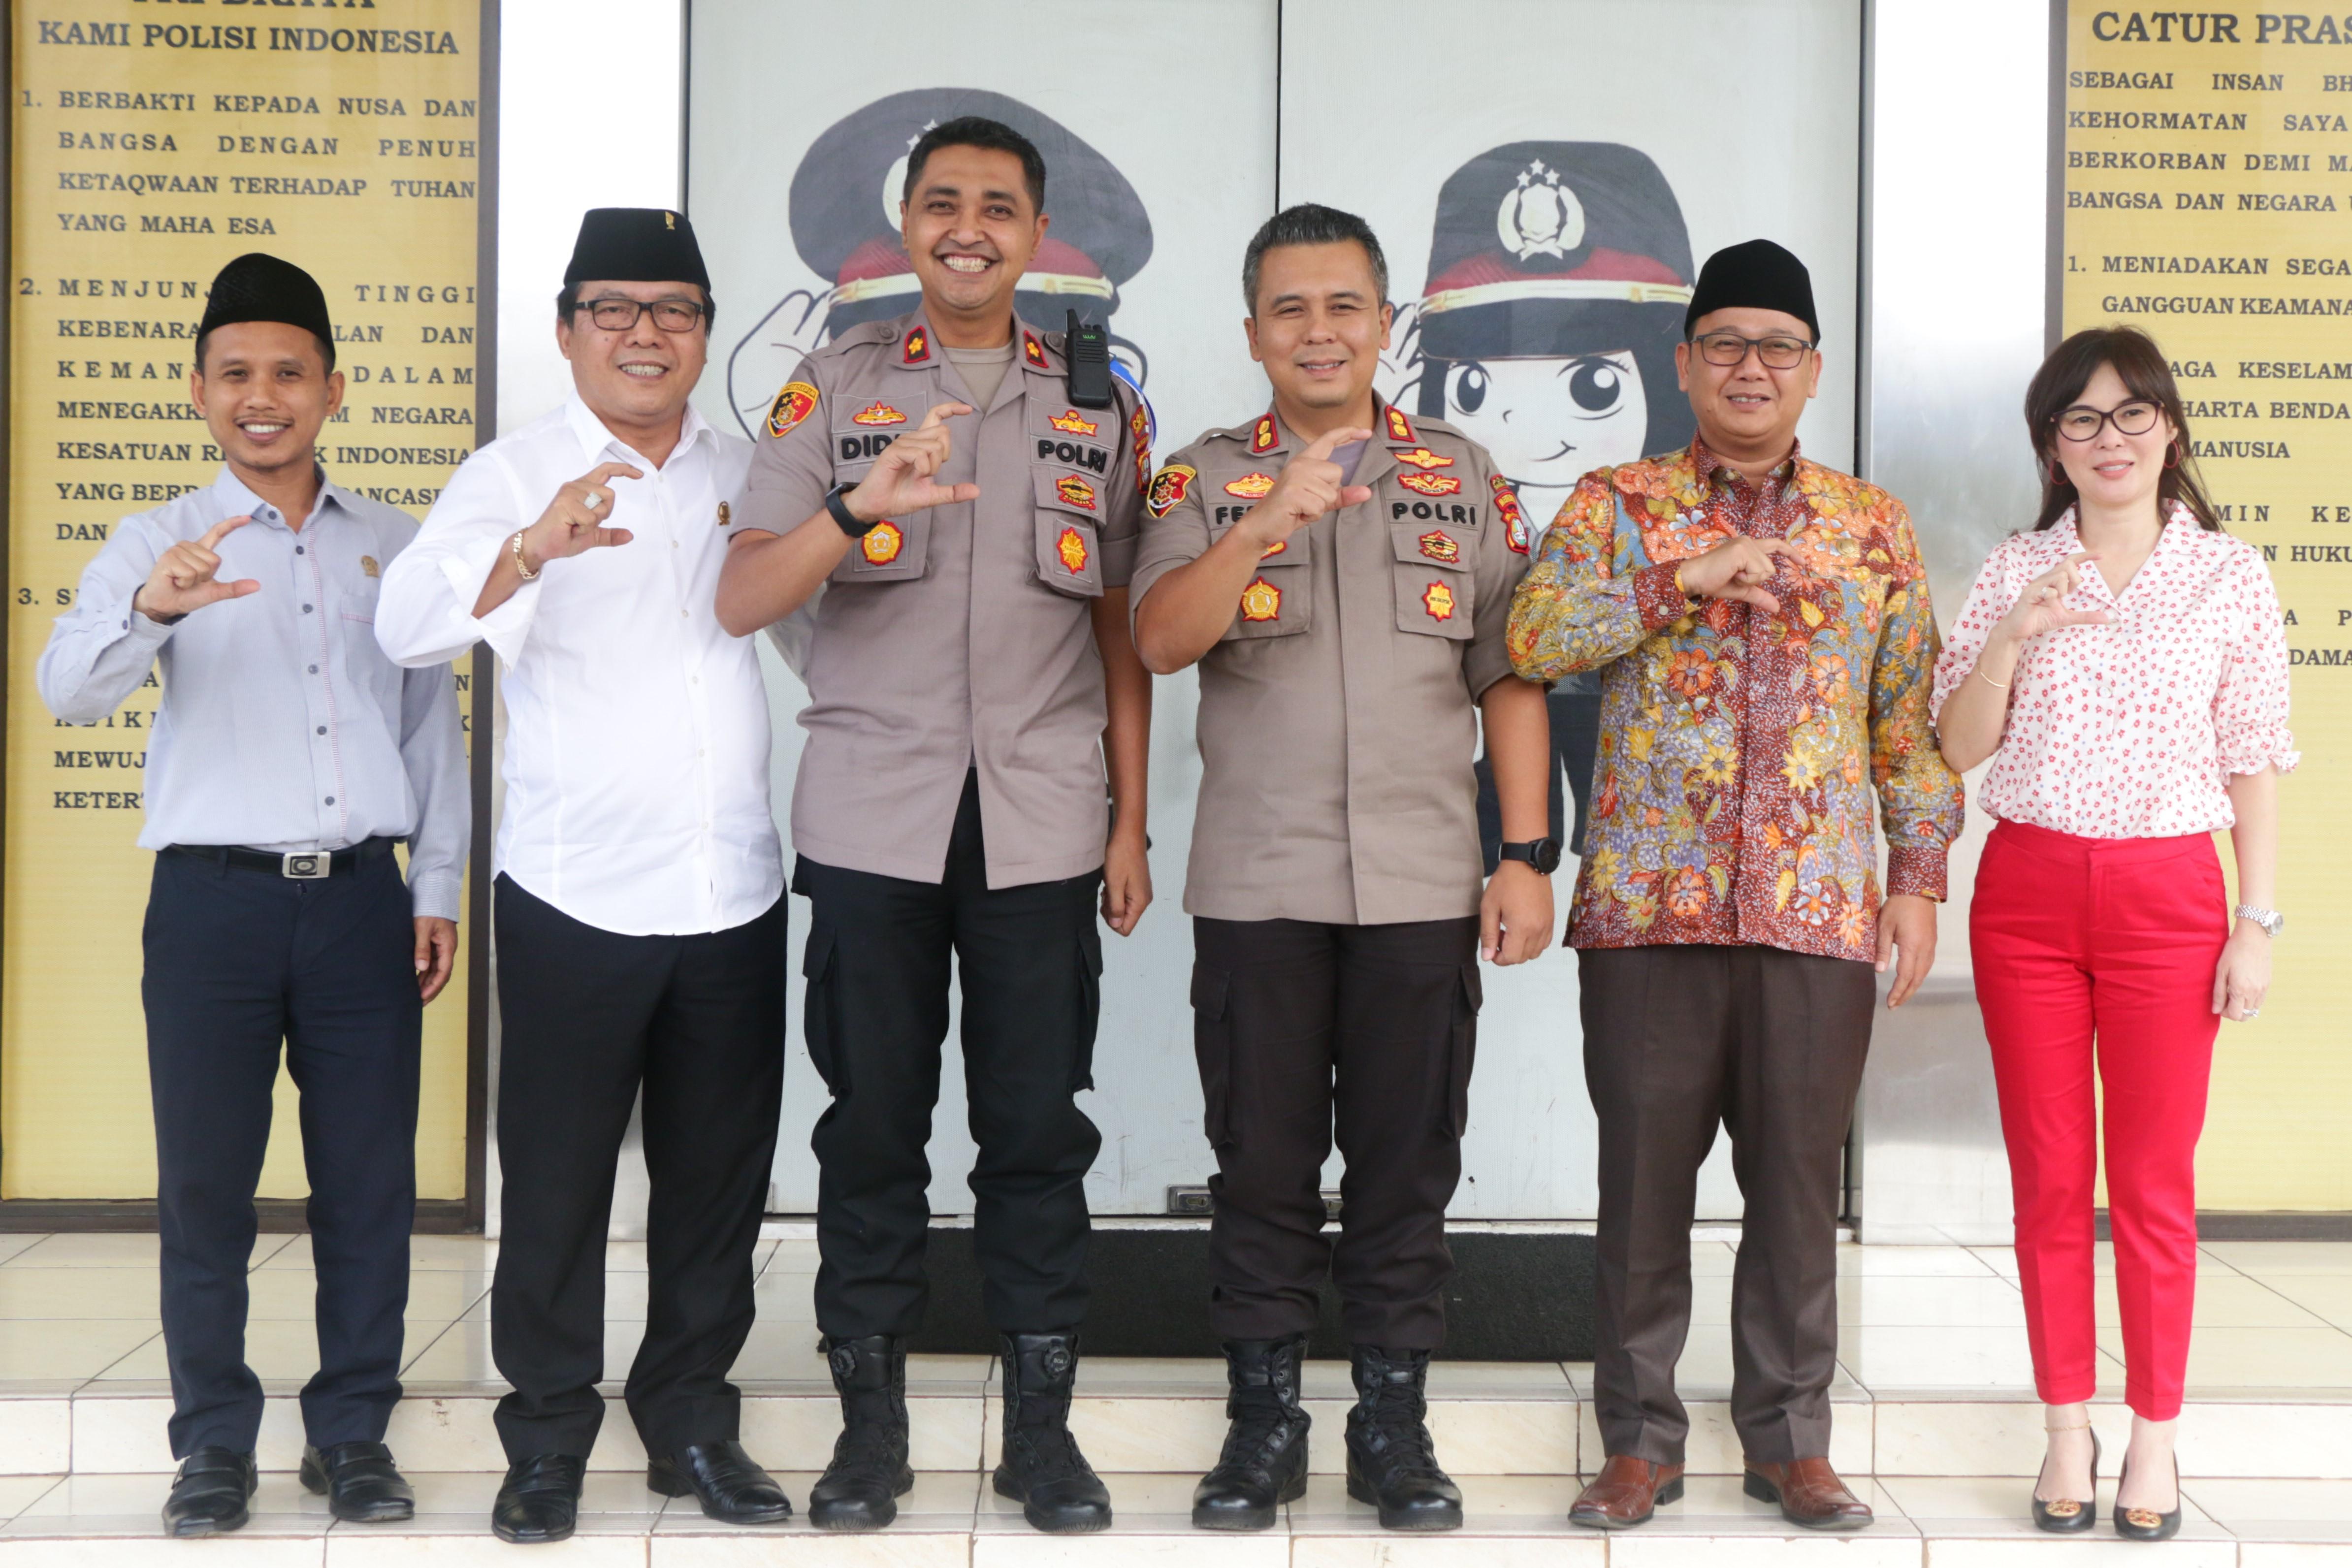 Pimpinan DPRD Silaturahmi Ke Polres Kota Tangerang Selatan